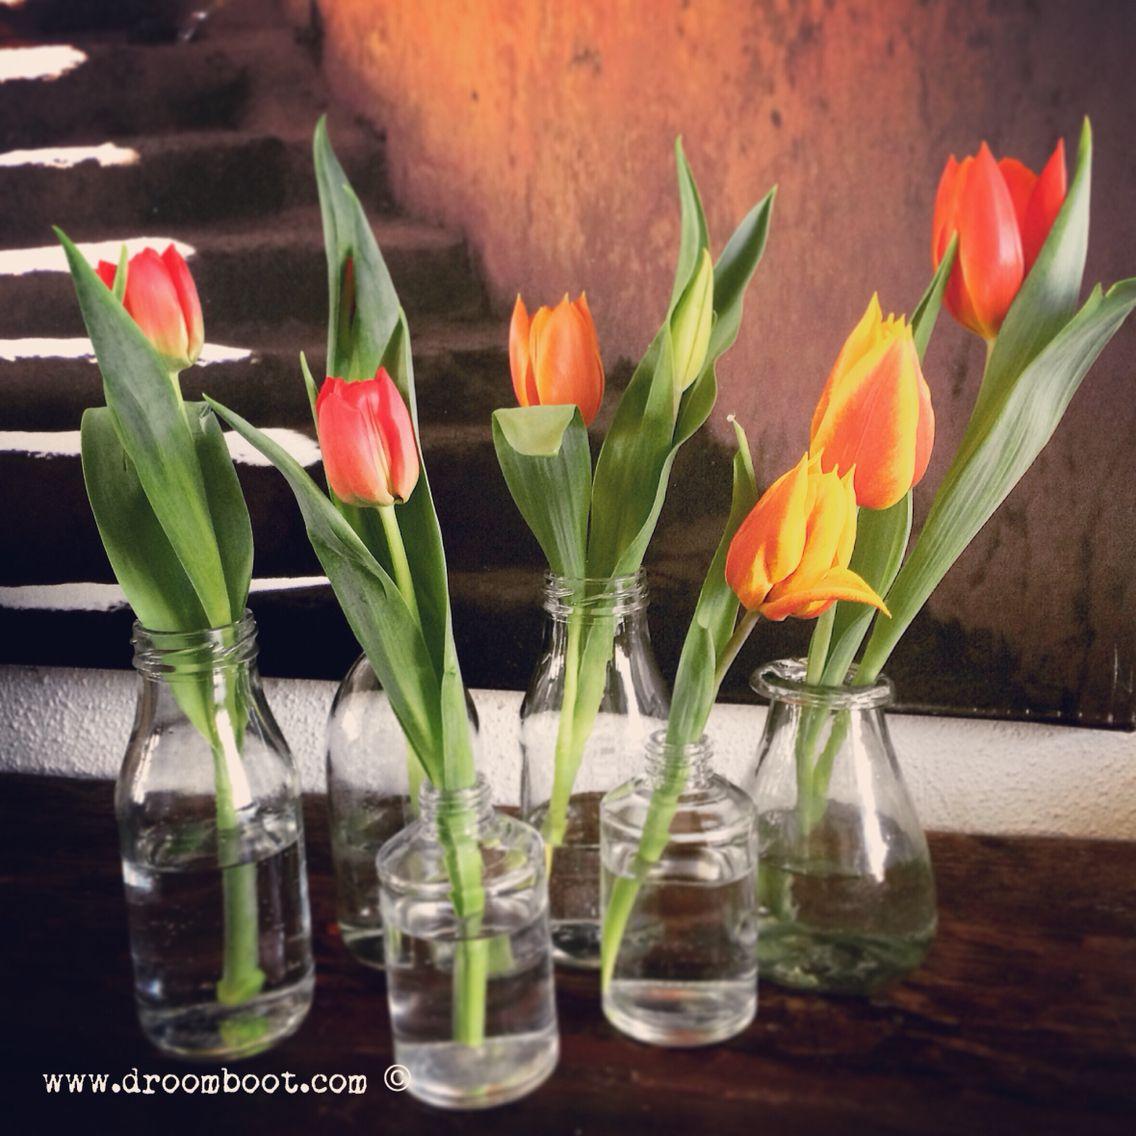 Tulips from Amersfoort ;-)